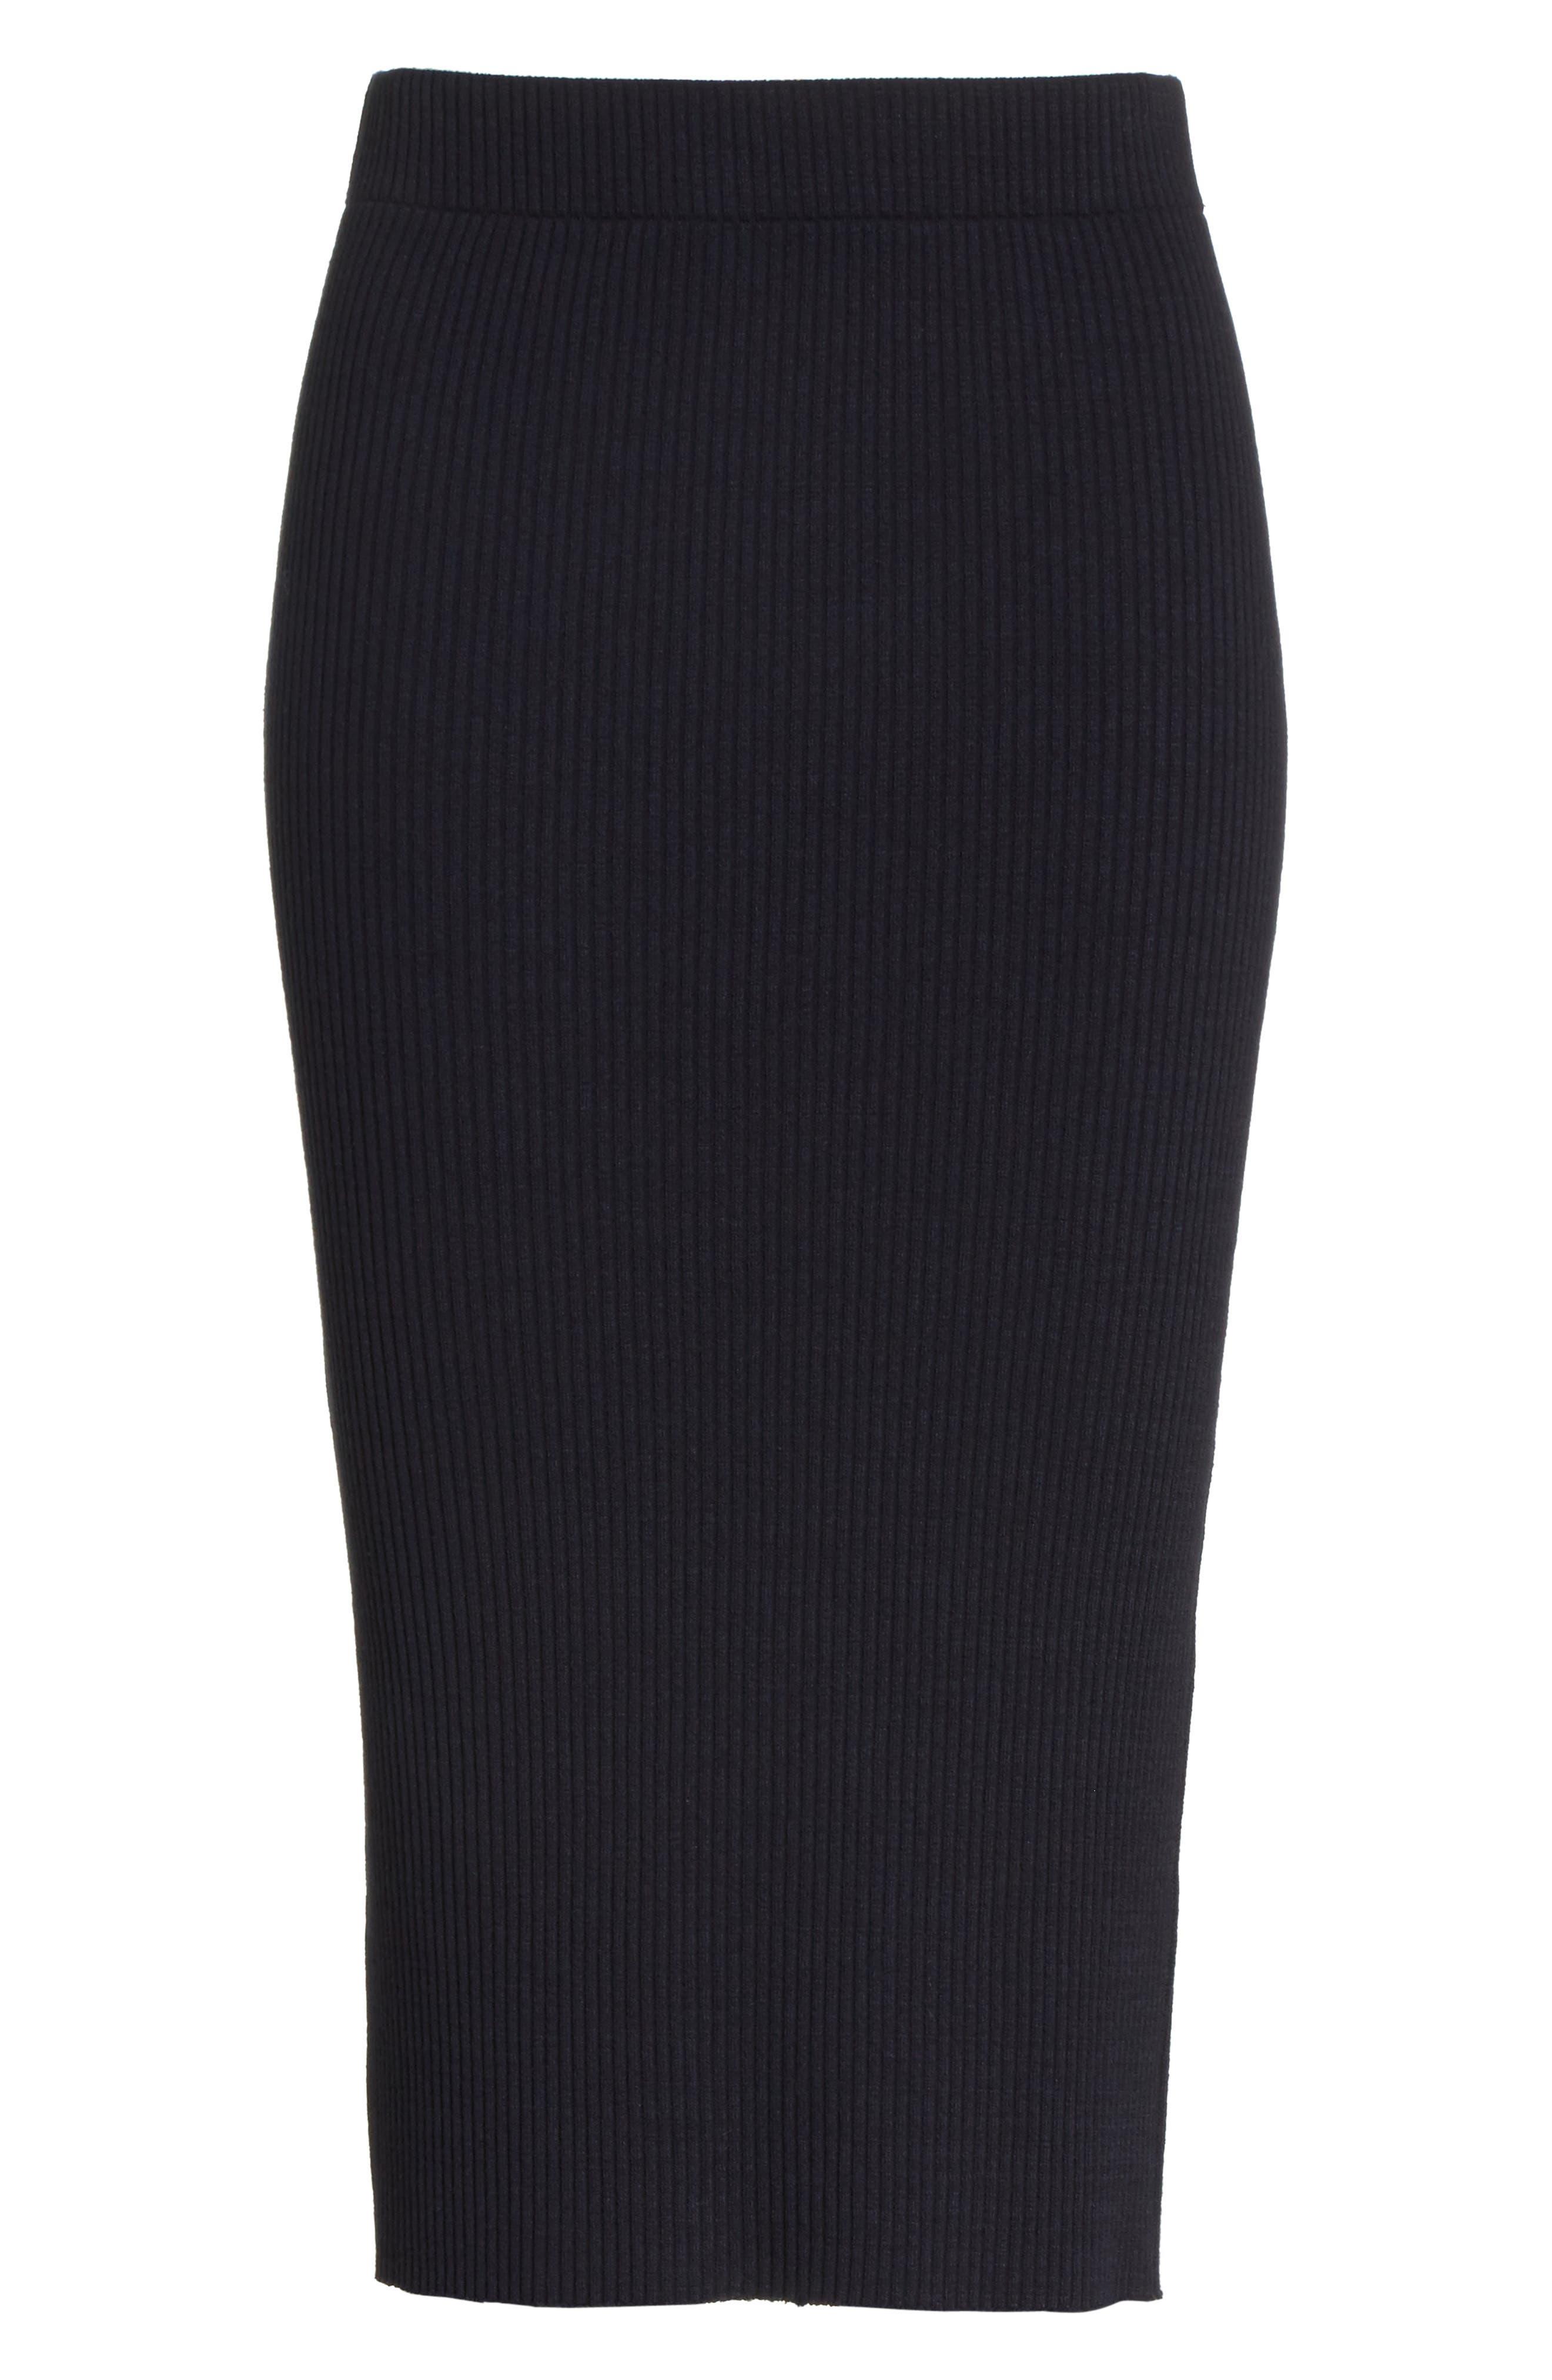 Ribbed Pencil Skirt,                             Alternate thumbnail 6, color,                             403